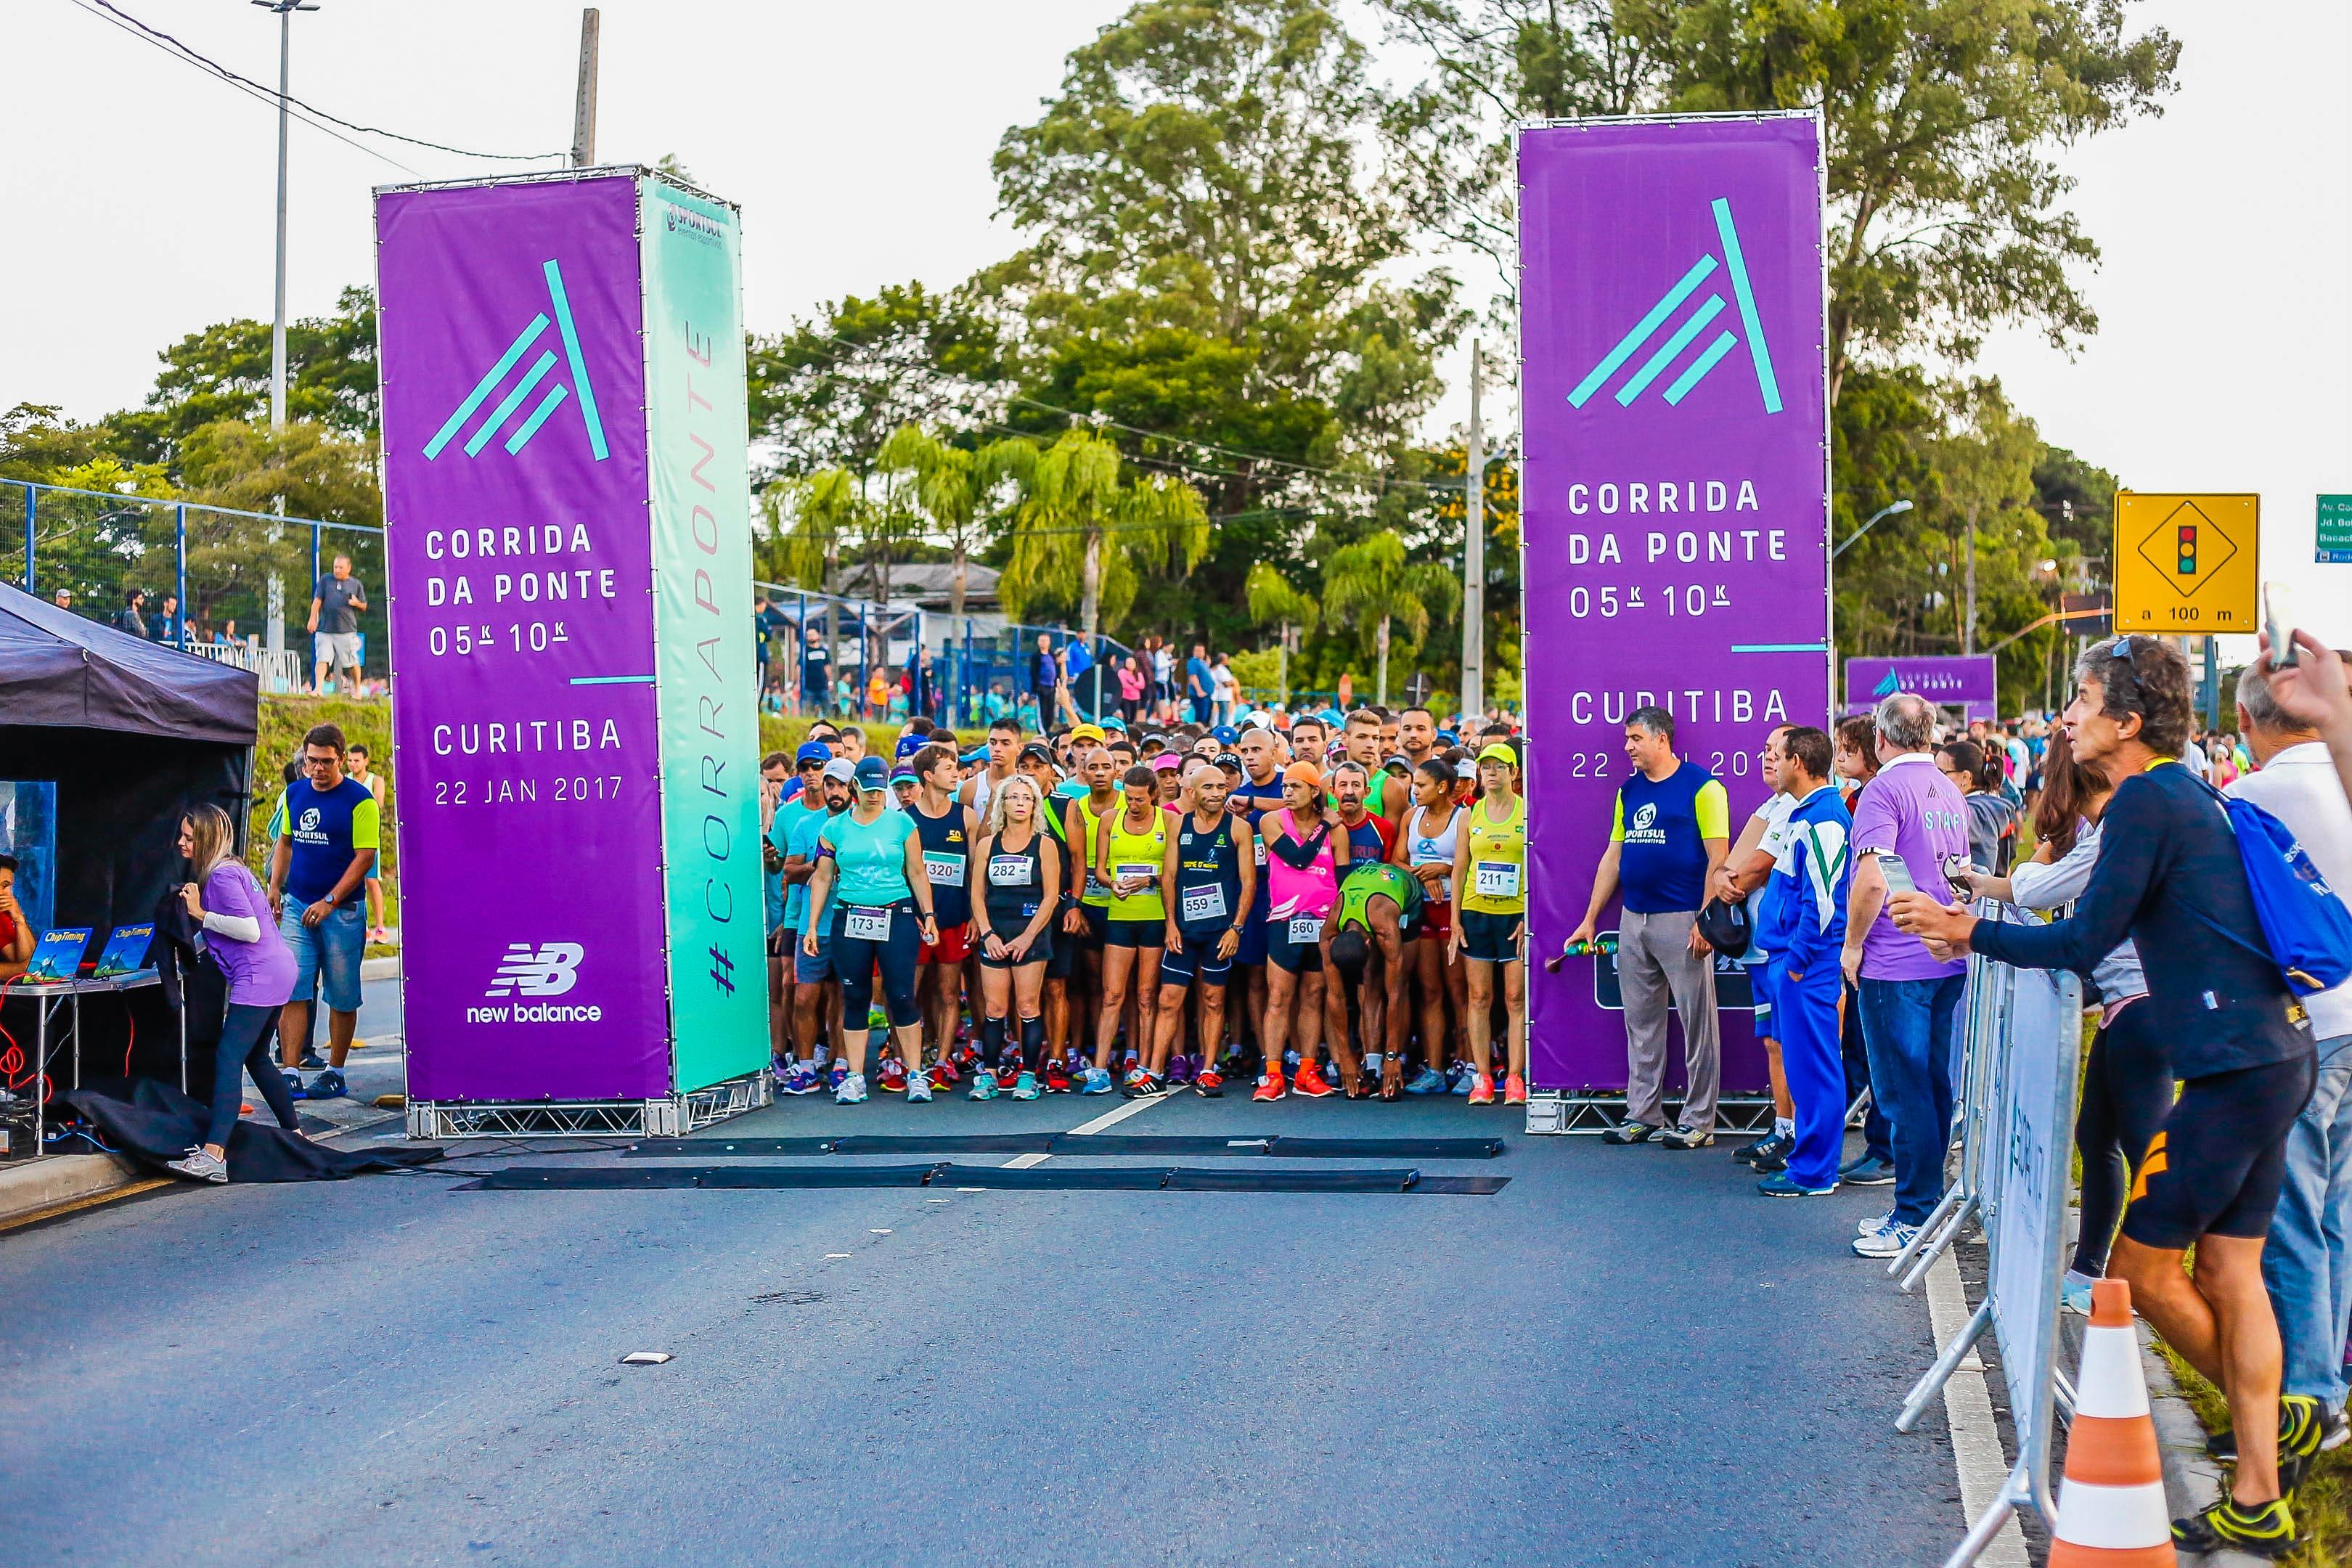 corrida new balance 2017 curitiba